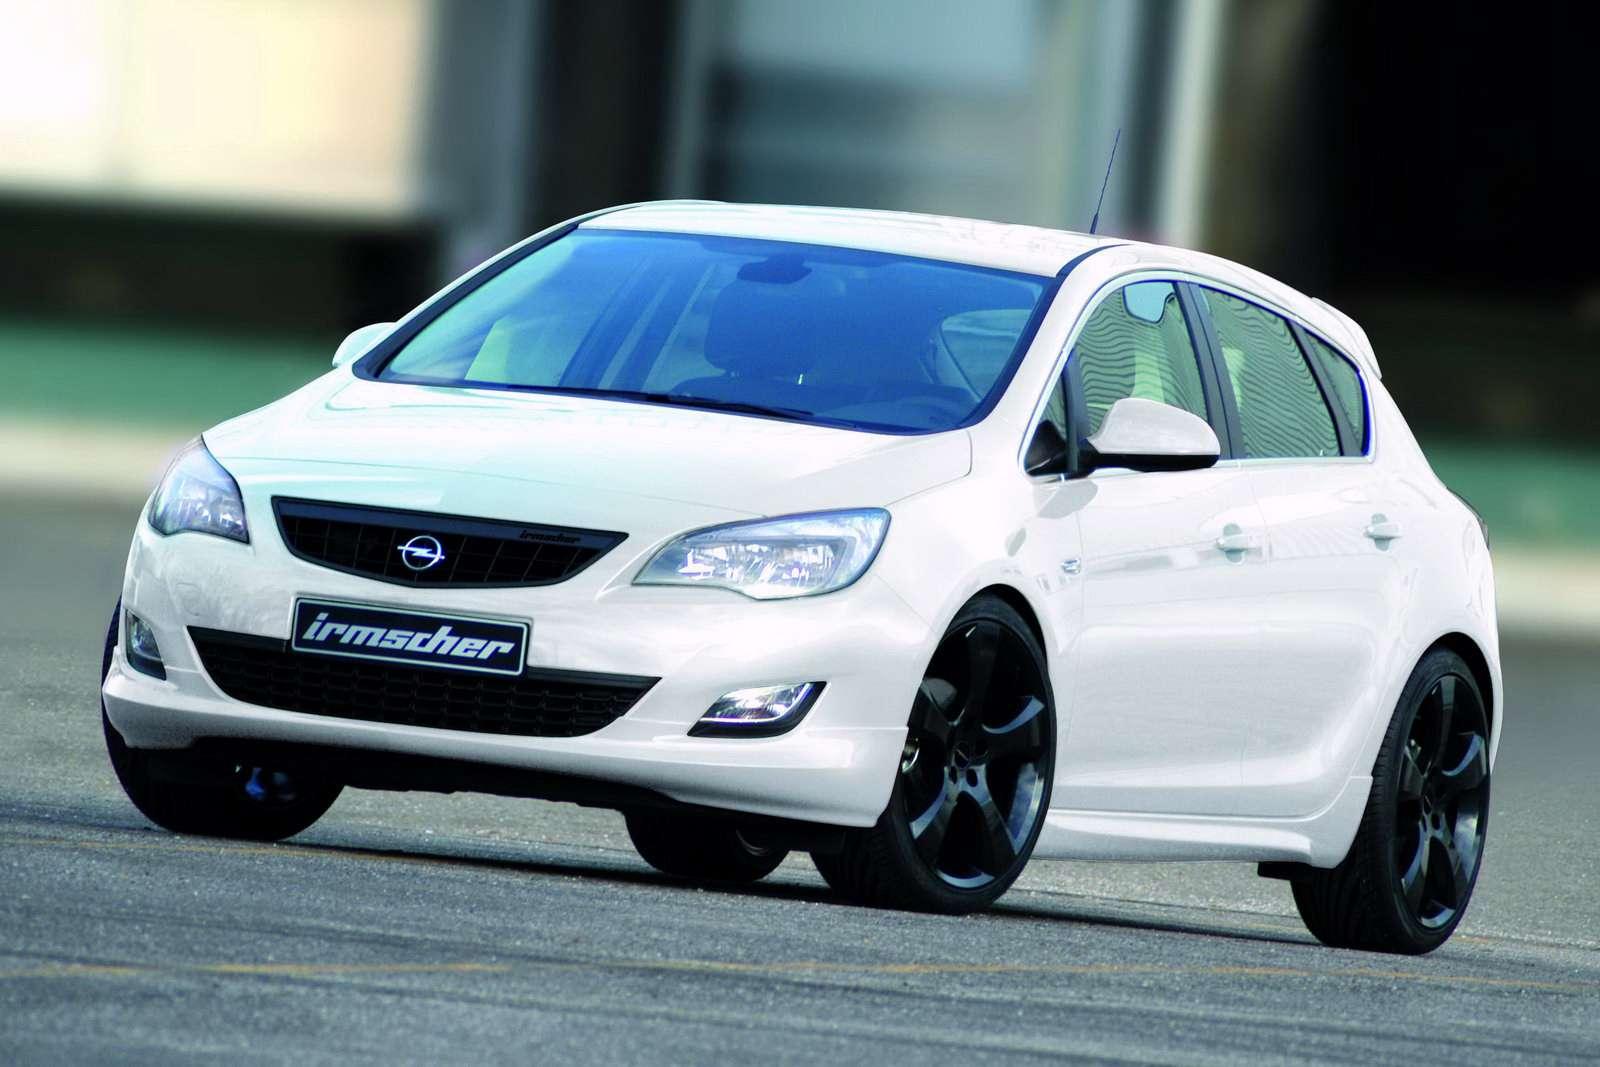 Opel Astra 2010 Irmscher new photo 2009